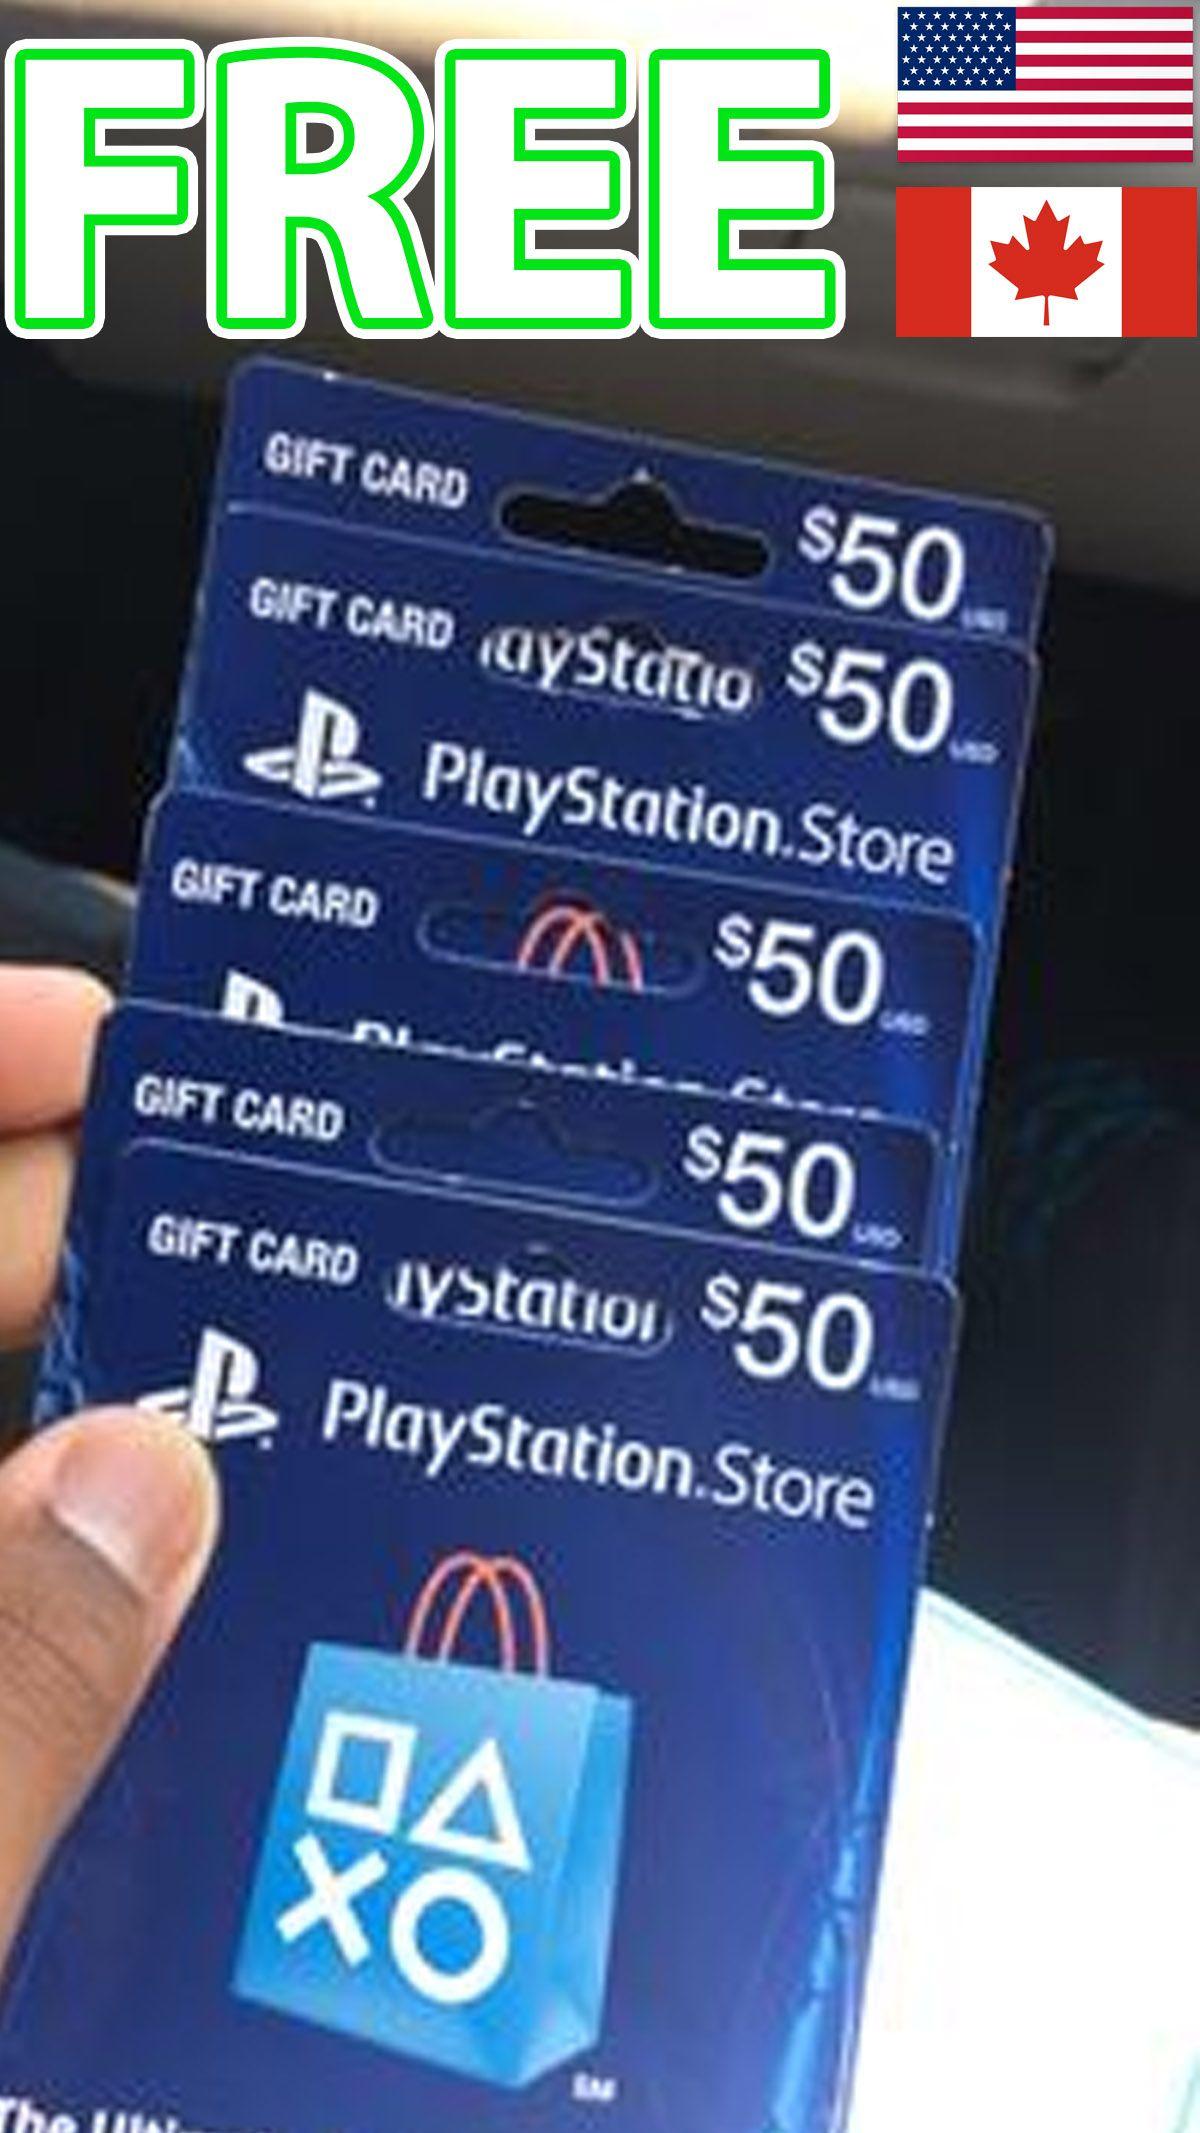 Free psn cards get free psn codes playstation gift